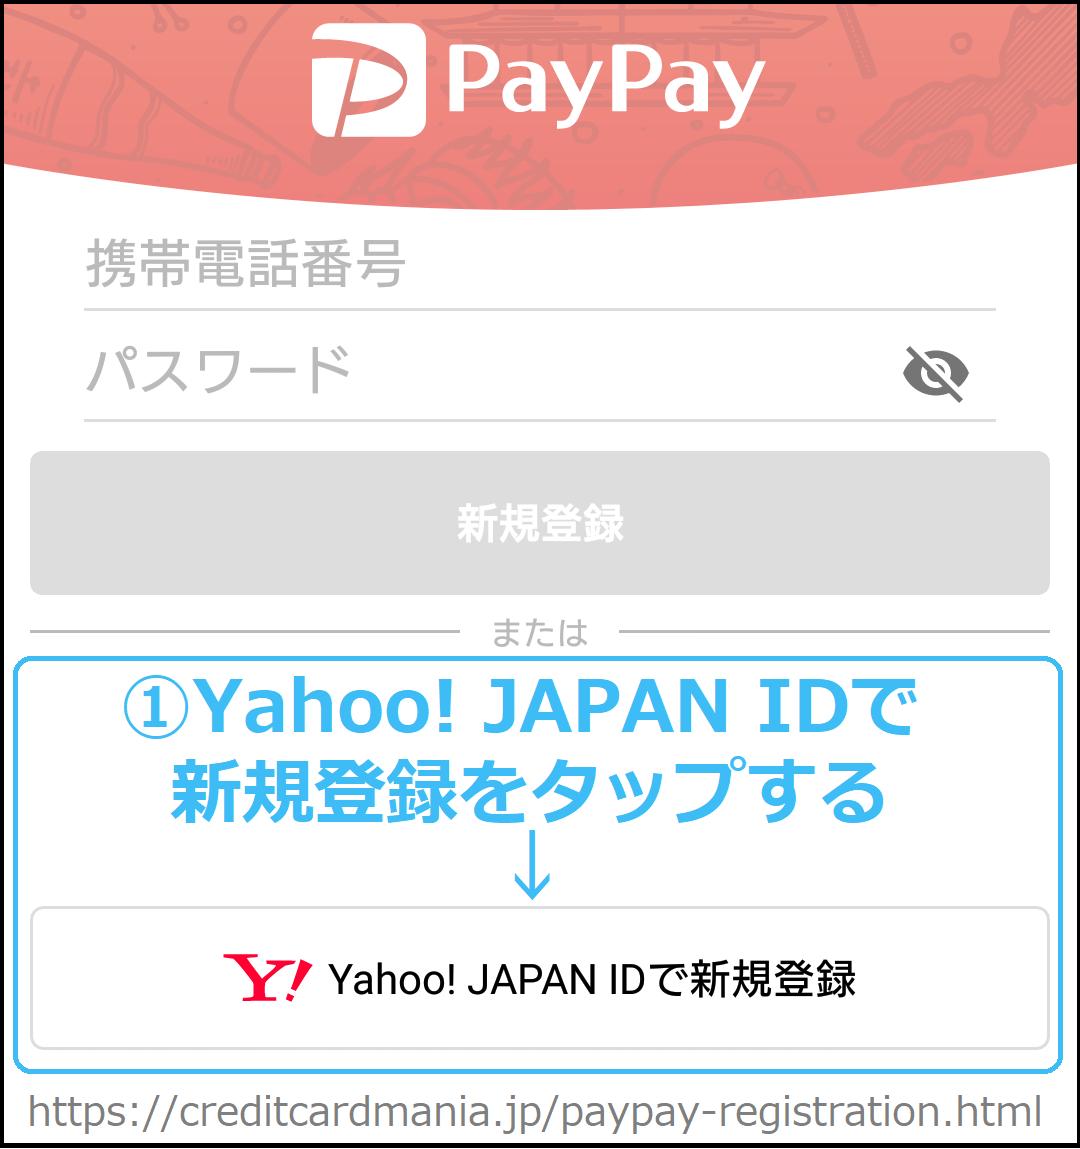 PayPayの新規登録(ヤフージャパンID編)